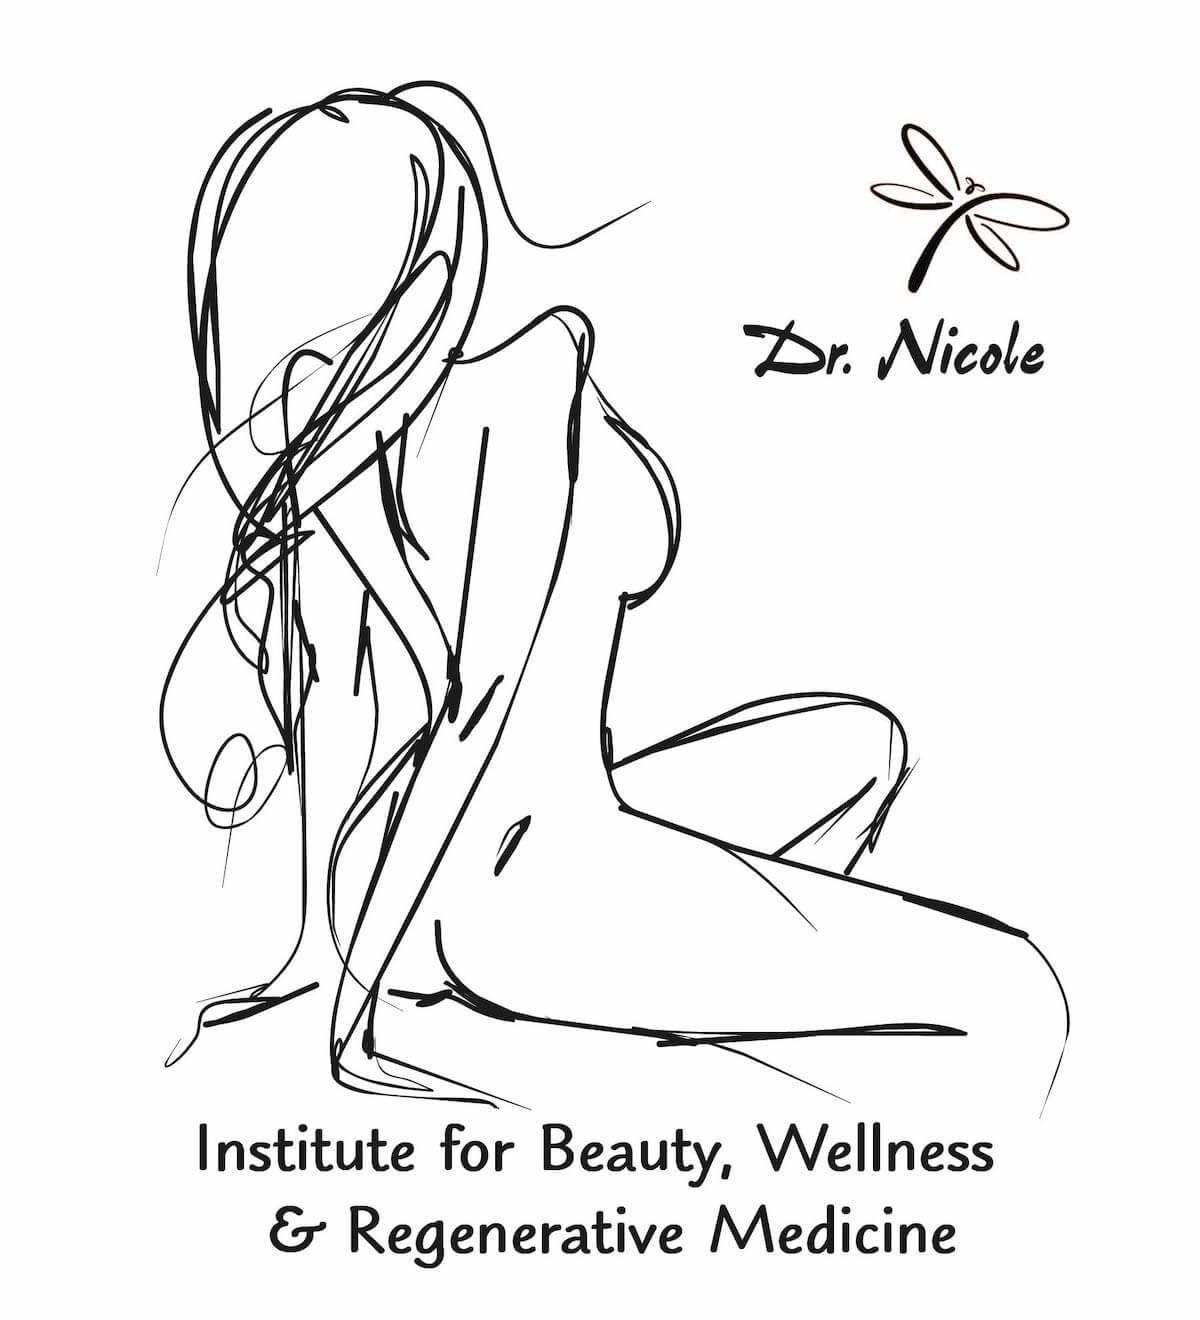 Dr. Nicole's Designs